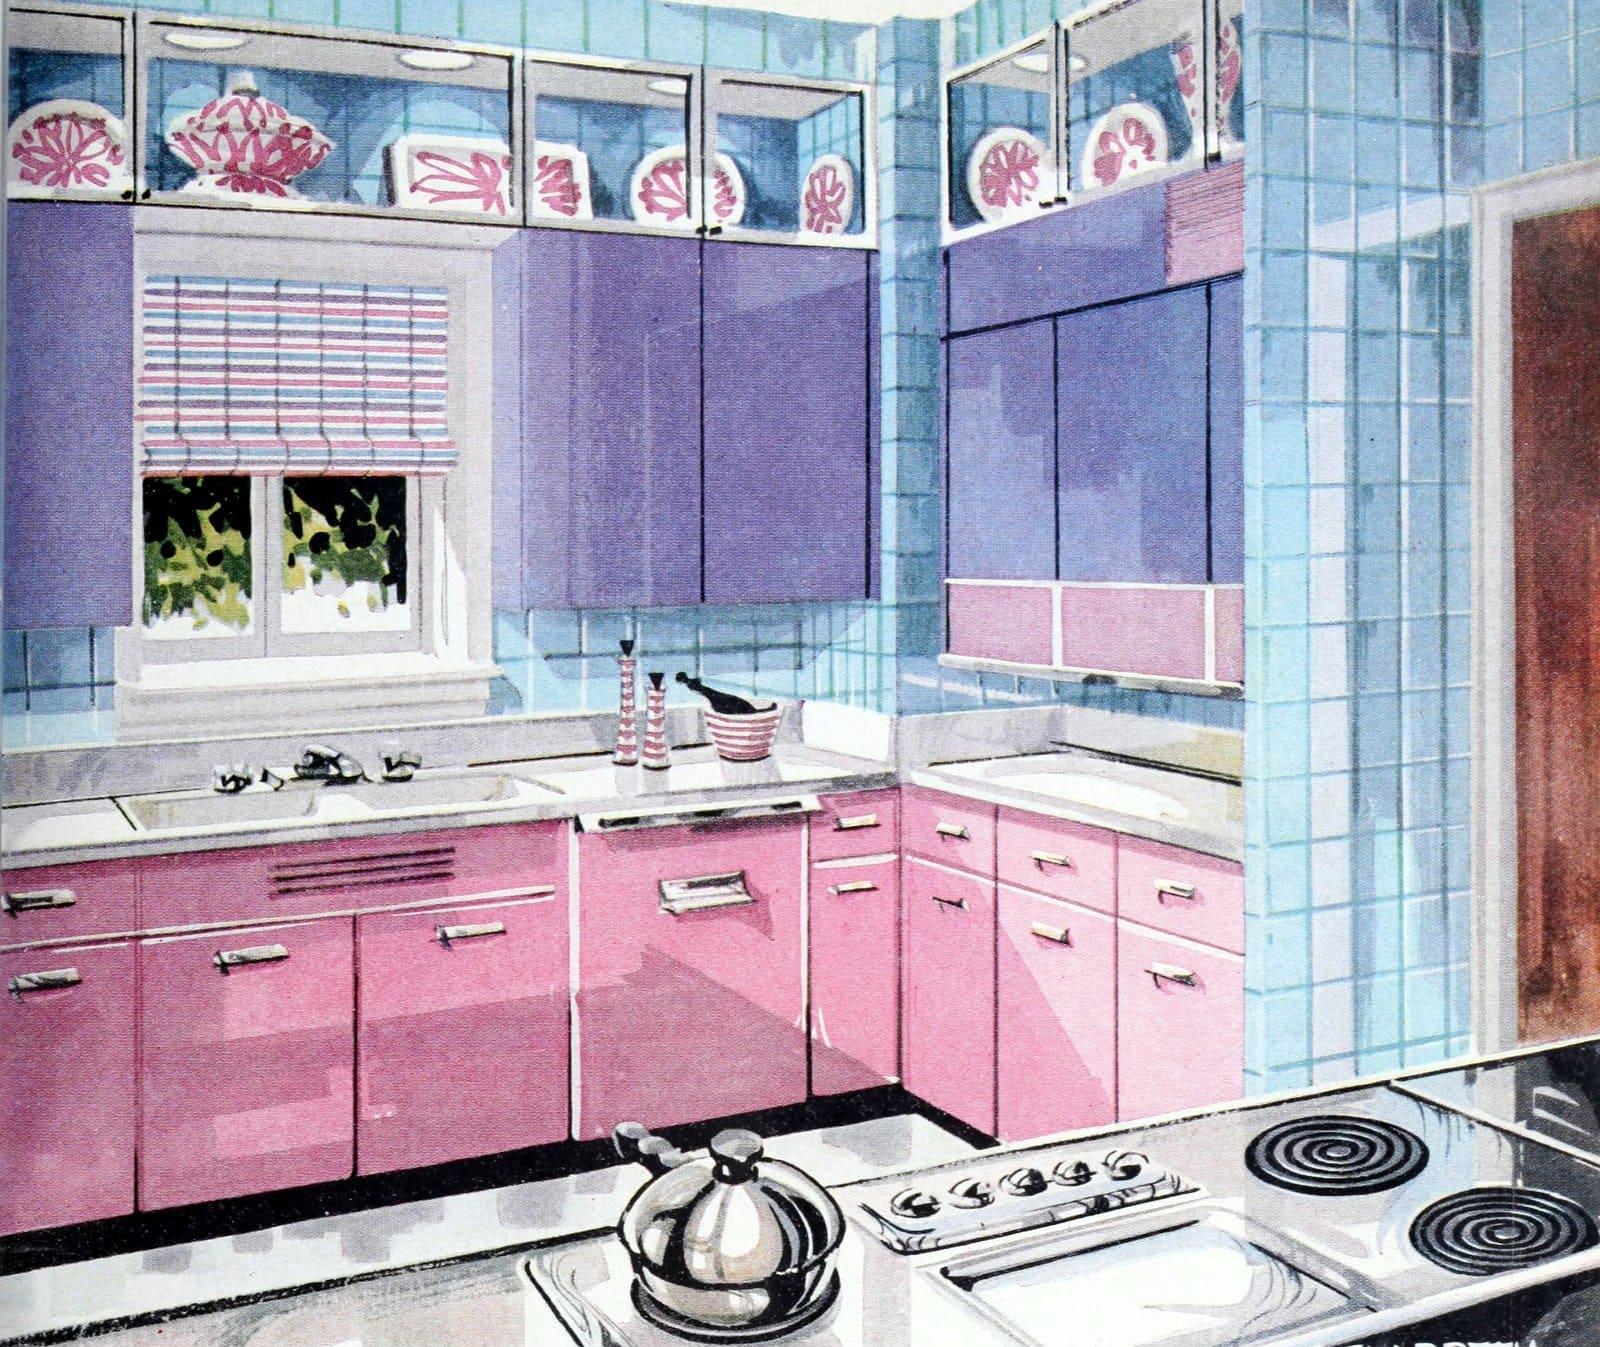 Vintage pink 1950s kitchen with bonus purple cabinets (1956)